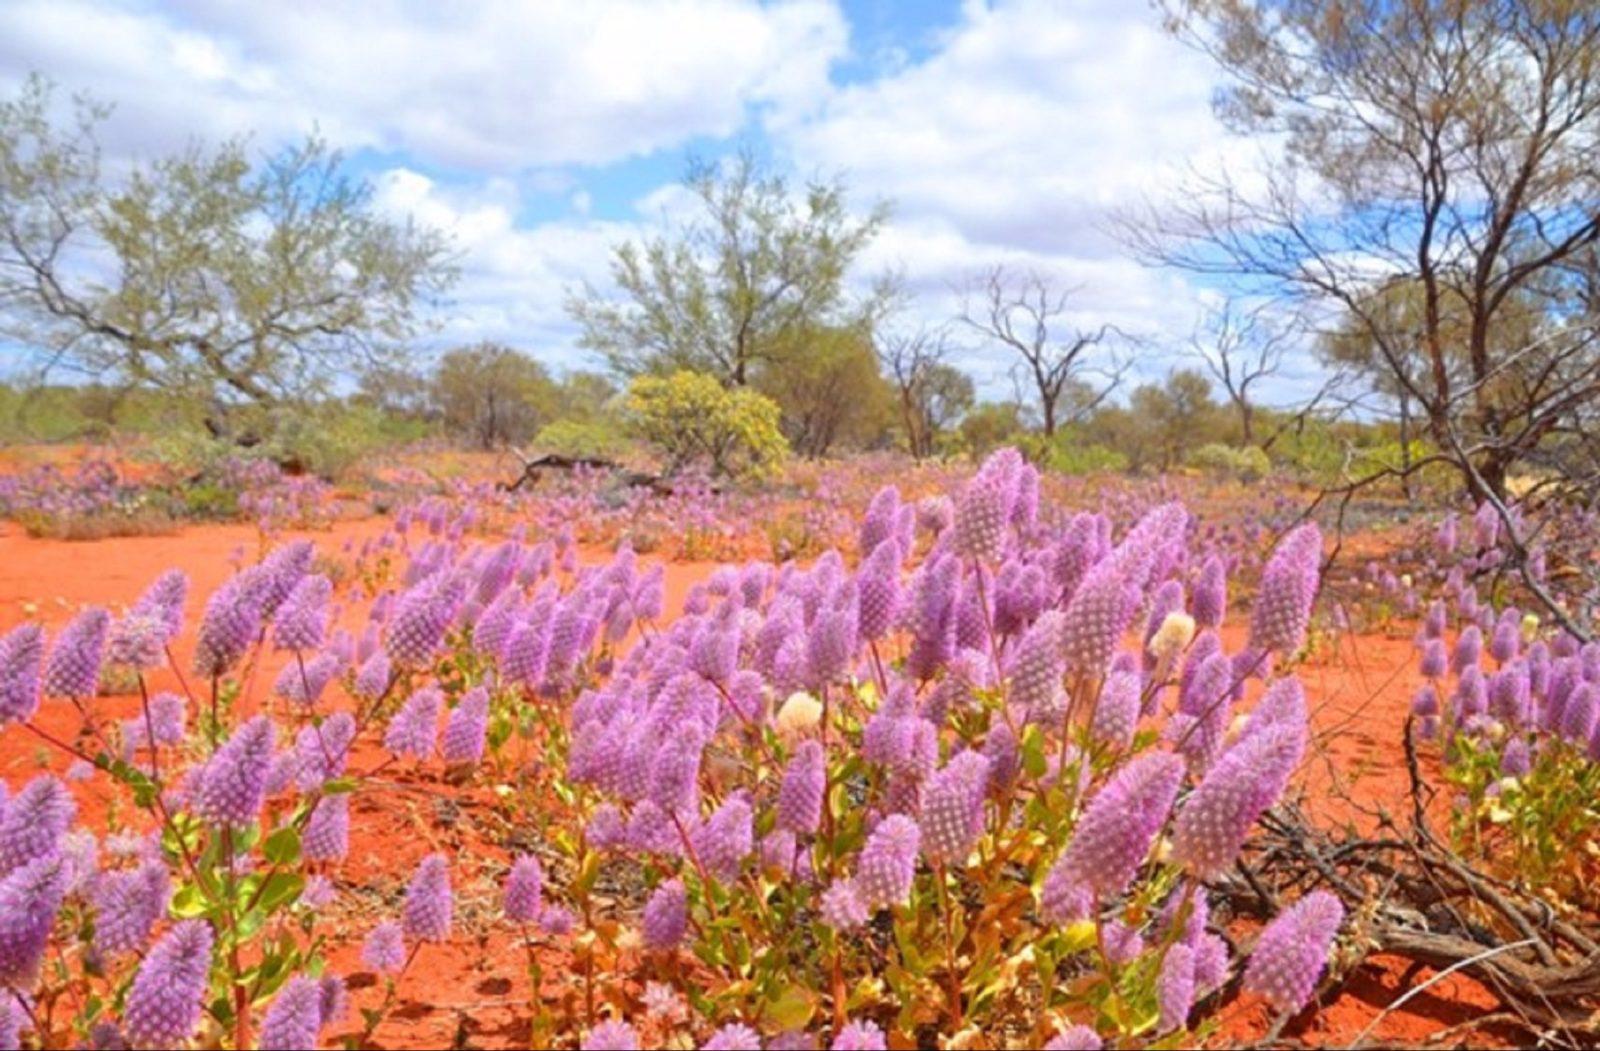 Gascoyne Murchison Outback Pathways, Western Australia